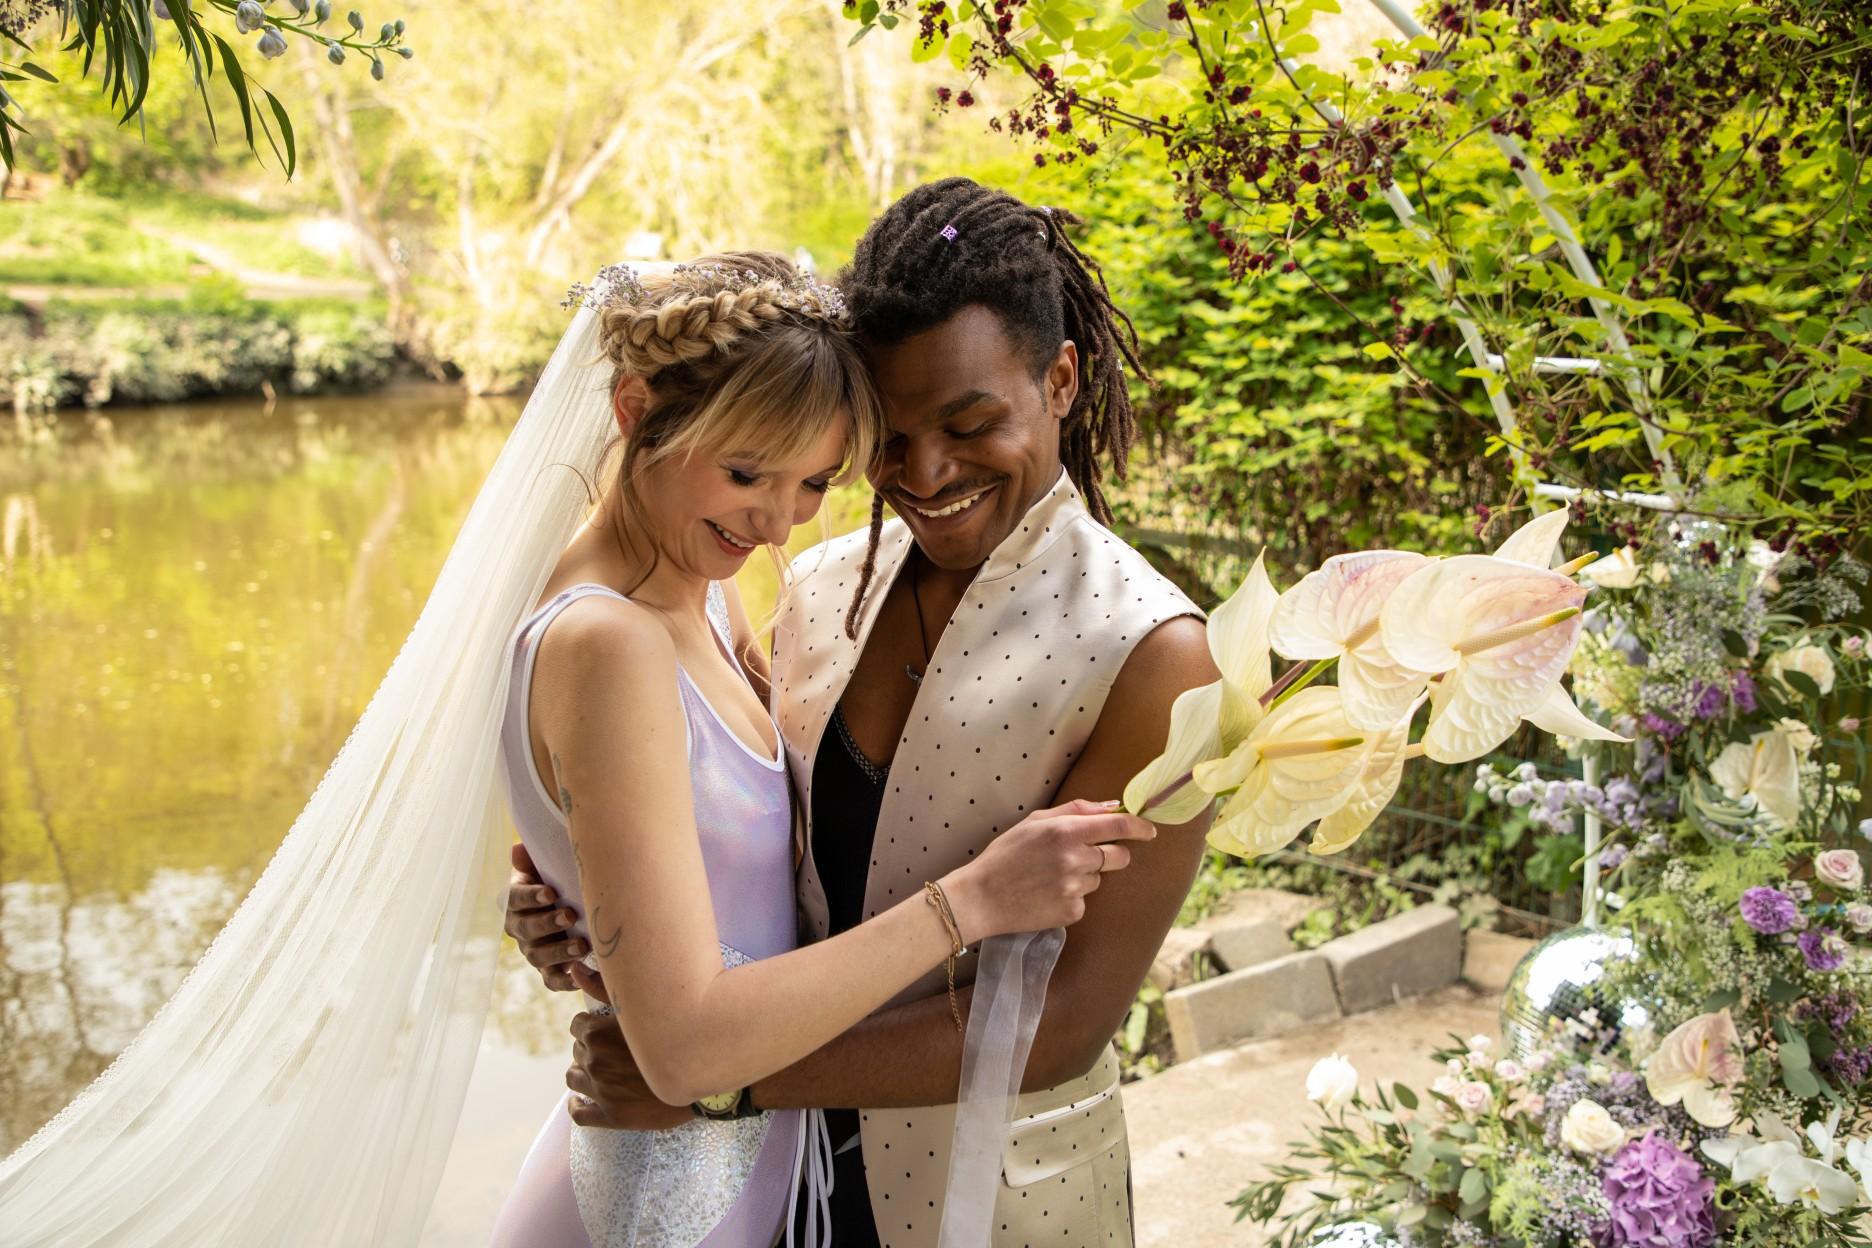 bride and groom smiling at wedding ceremony -modern festival wedding - unique wedding wear - wedding jumpsuit - wedding catsuit - festival bride - unique wedding wear